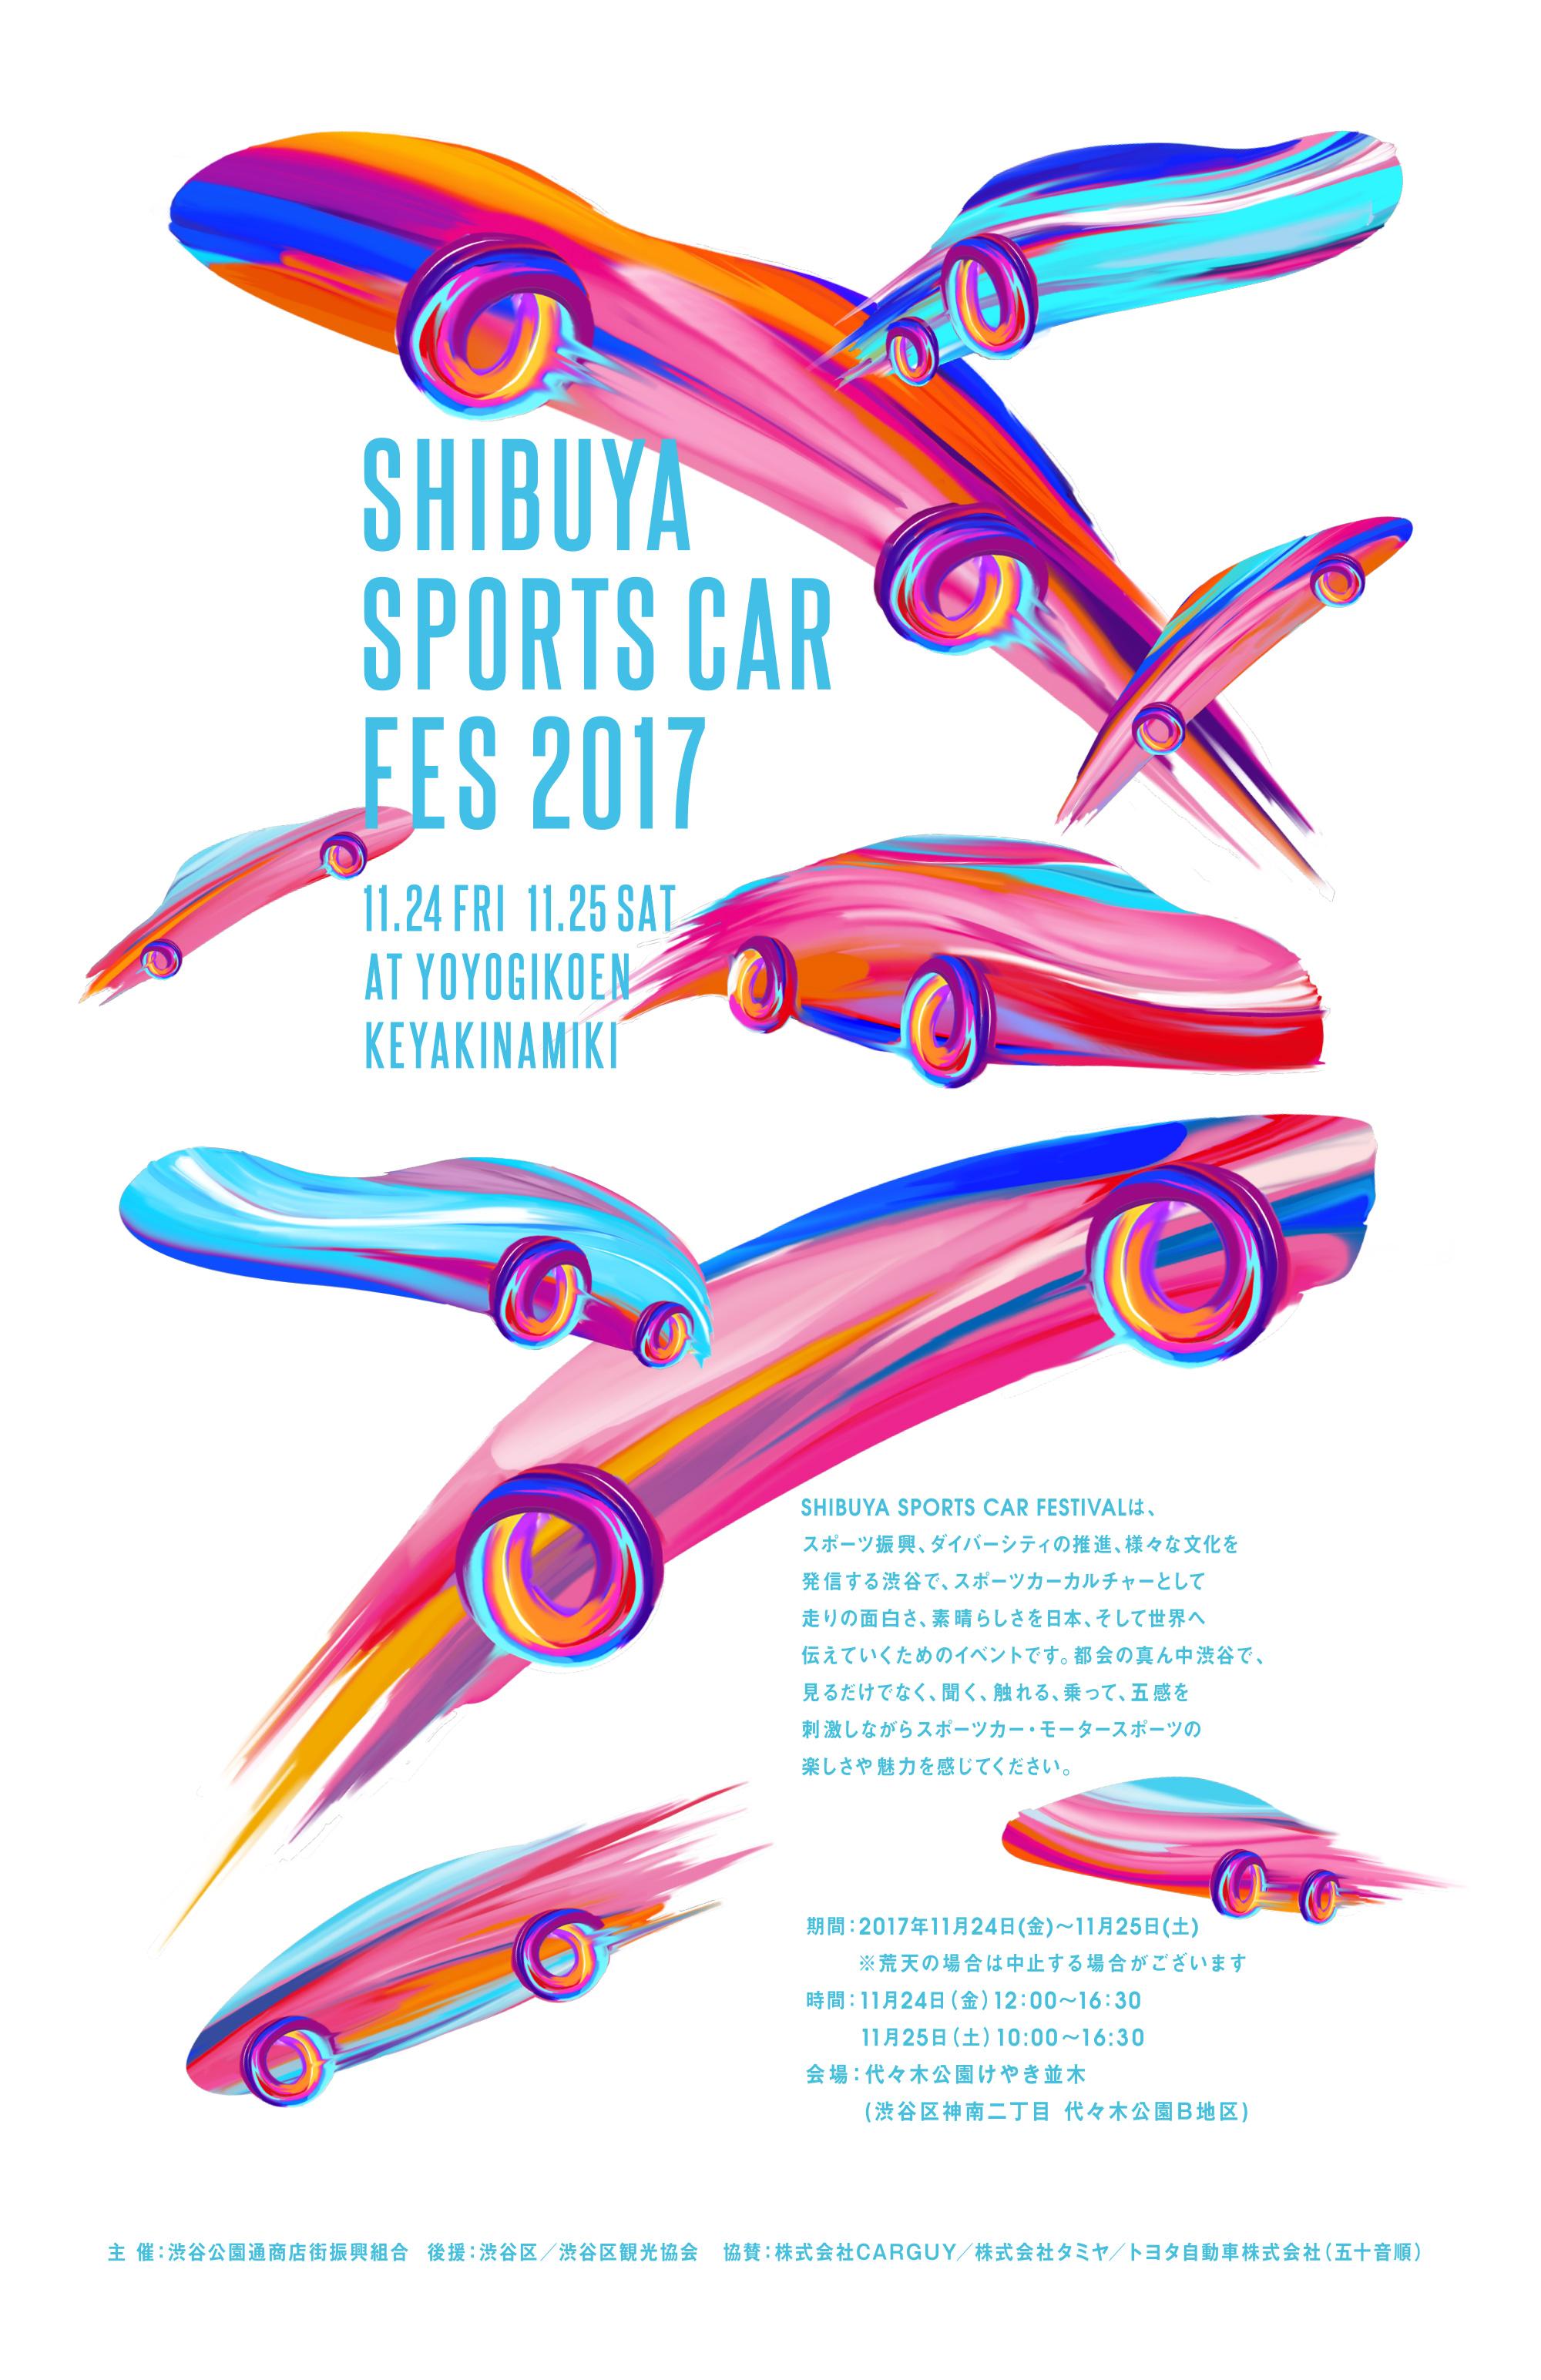 『SHIBUYA SPORTS CAR FES 2017』(シブヤ #スポーツカーフェス2017 )11/24・25@代々木公園 #スポーツカー #TAMIYA #ハチロク #ランボルギーニ #ポルシェ #アストンマーティン @ 代々木公園けやき並木 | 渋谷区 | 東京都 | 日本